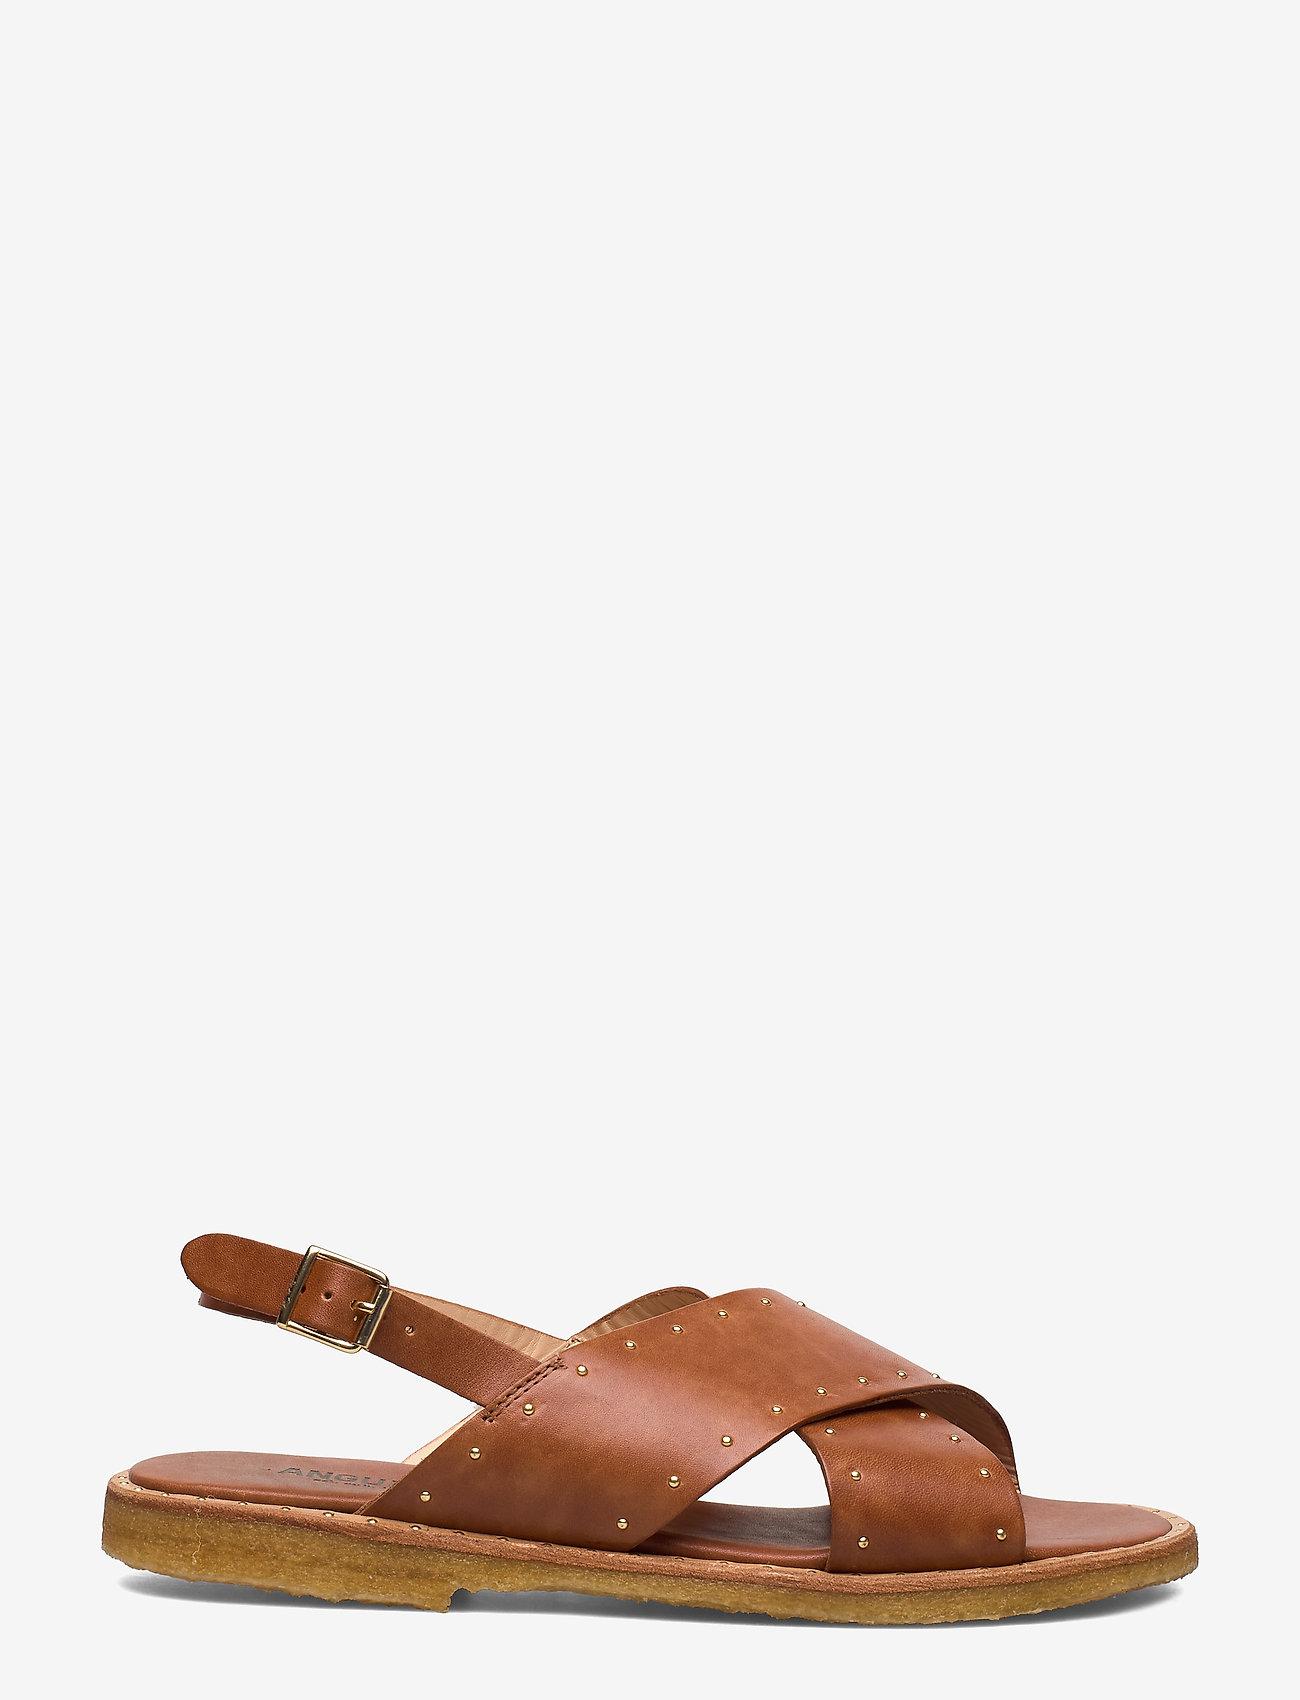 ANGULUS - Sandals - flat - open toe - op - flache sandalen - 1789 tan - 1